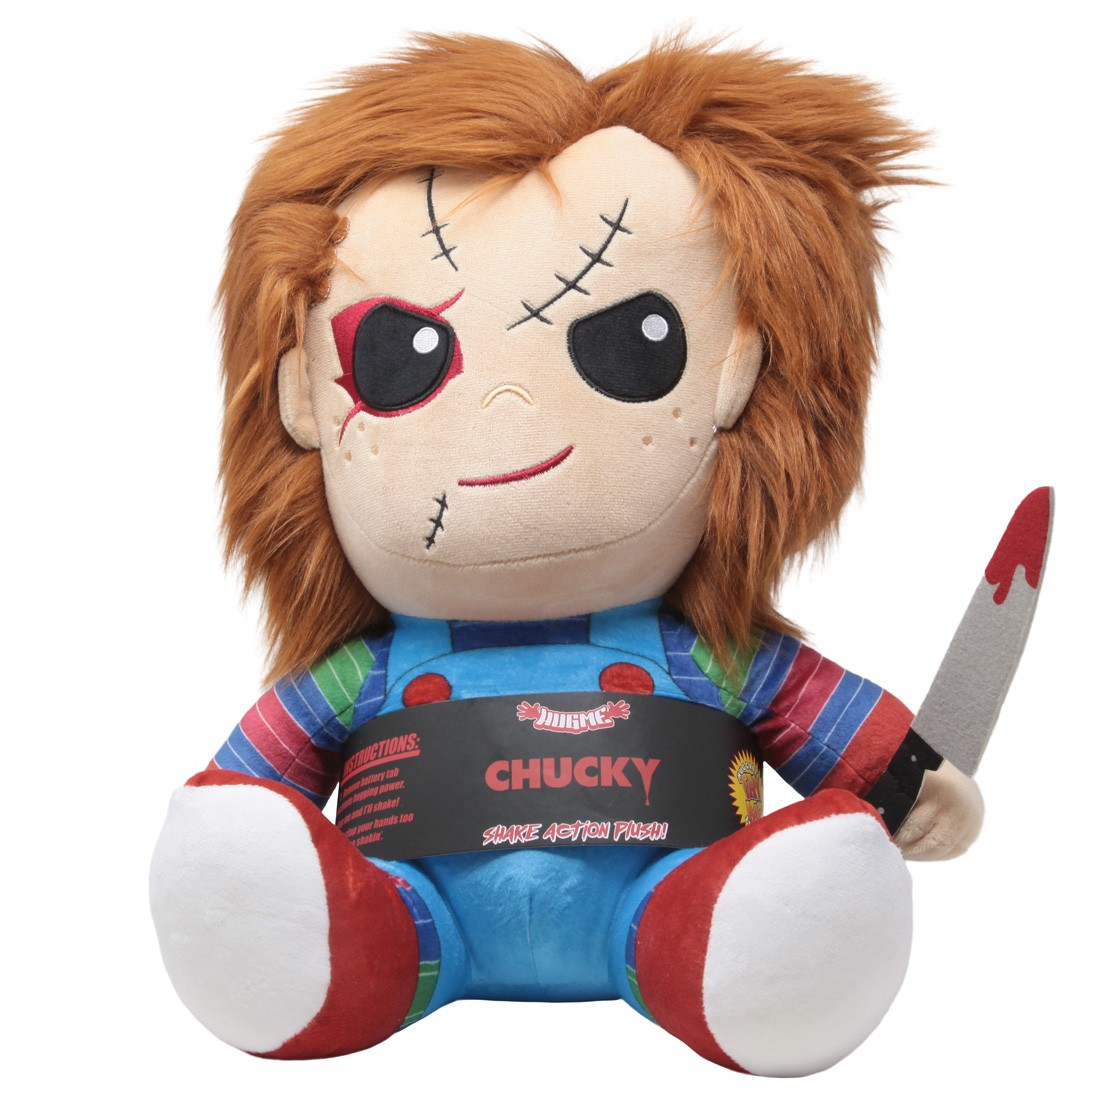 Kidrobot Child's Play Chucky HugMe Vibrating 16 Inch Plush (blue)